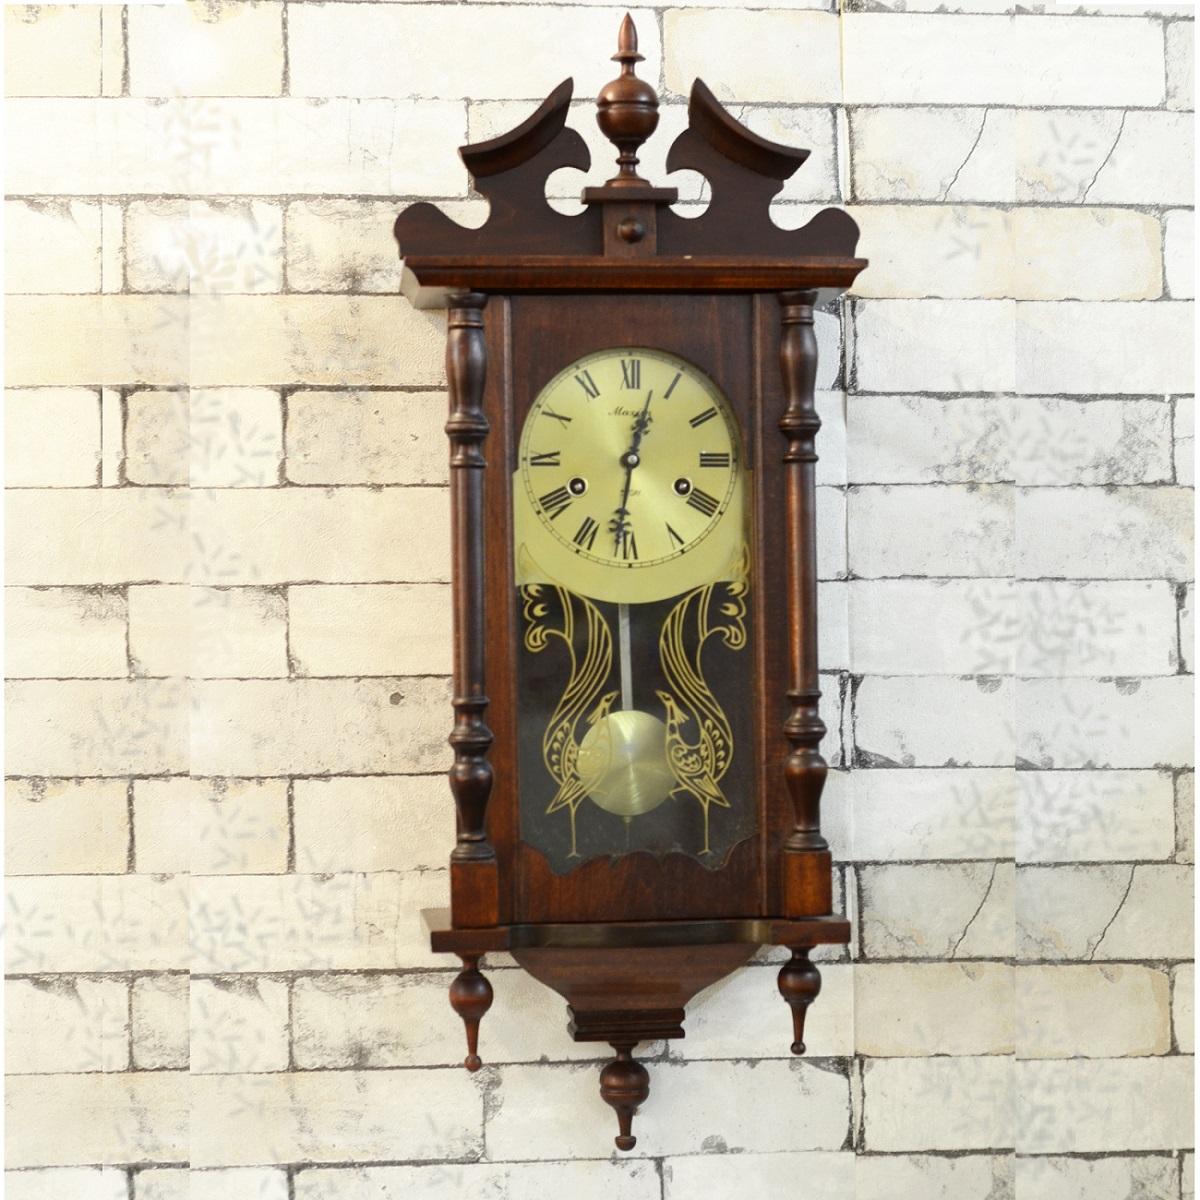 Vintage style 31 days winding polaris pendulum wall clock antikcart vintage style 31 days winding polaris pendulum wall clock sale hover to zoom amipublicfo Choice Image